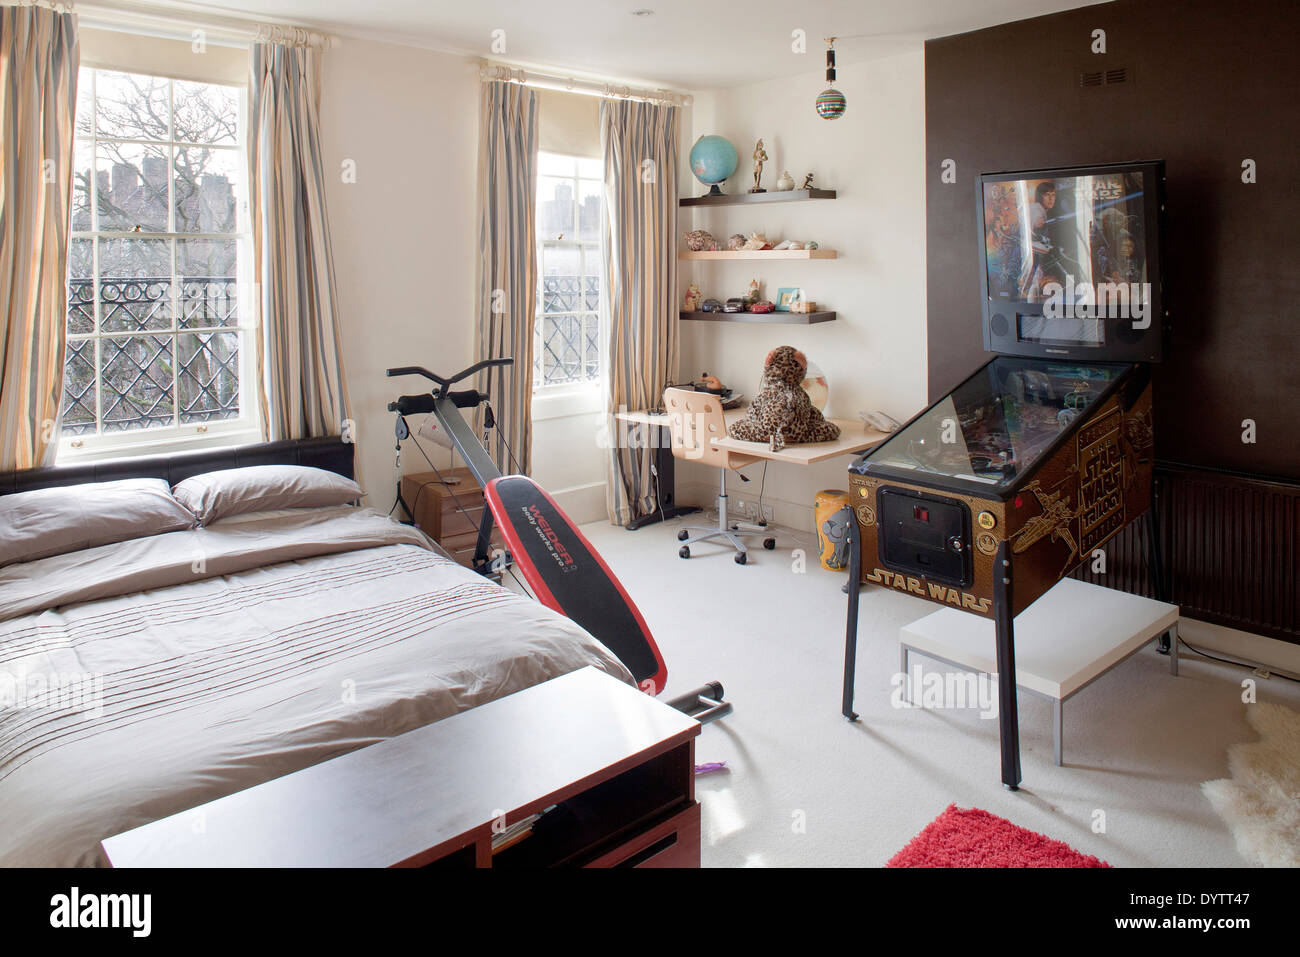 Teenagers bedroom with pinball machine London Stock Photo 68772599